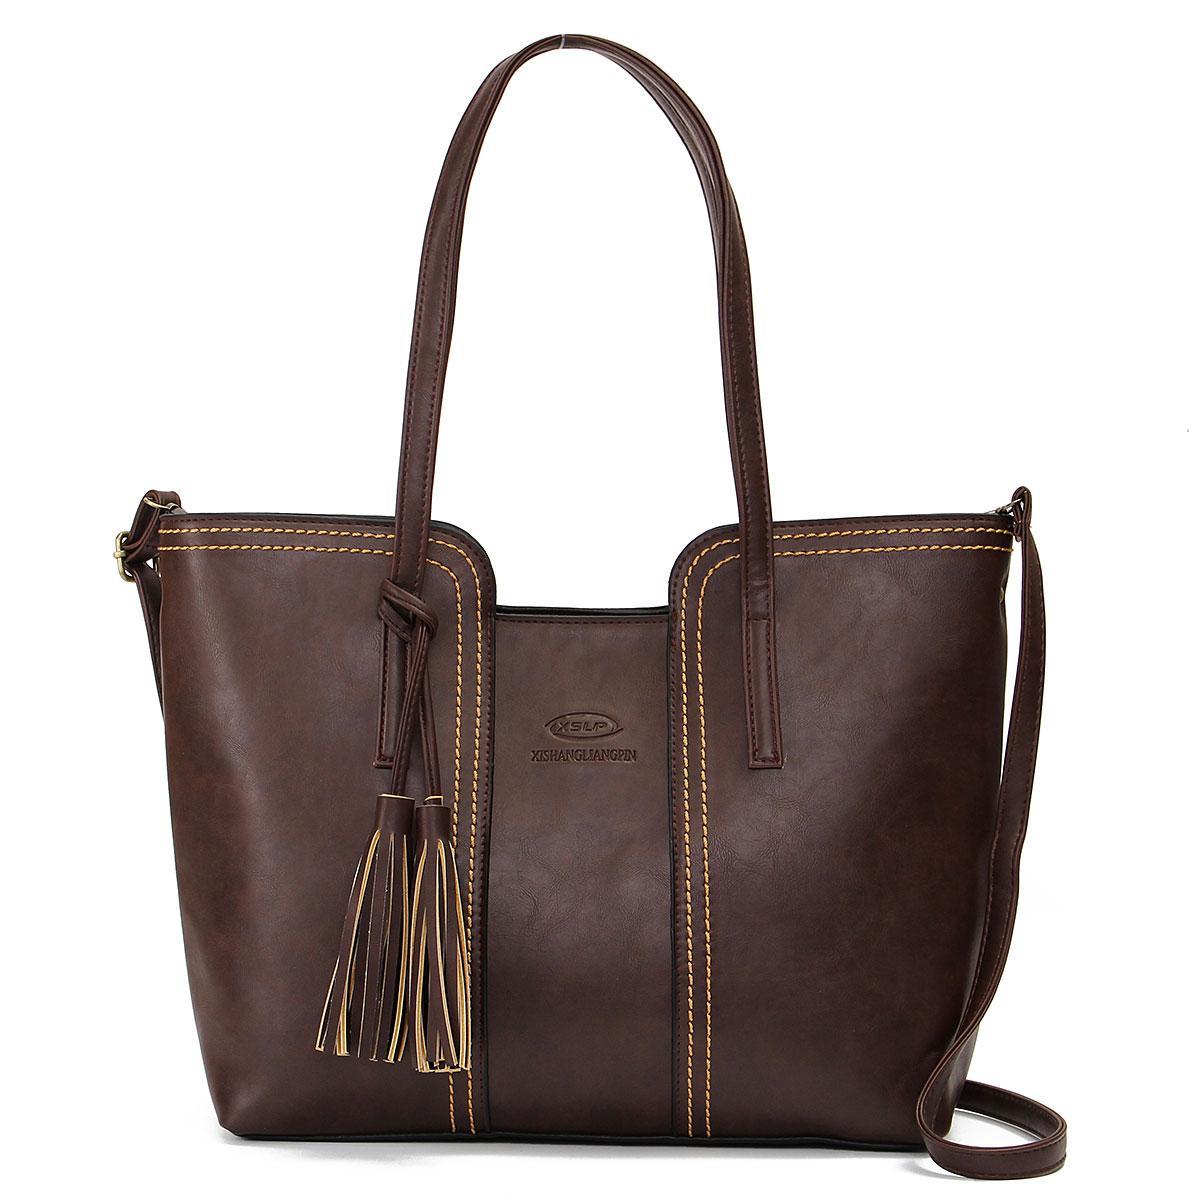 ed1639fc398 Buy Happy Island Tote Bags at Best Prices Online in Pakistan - daraz.pk